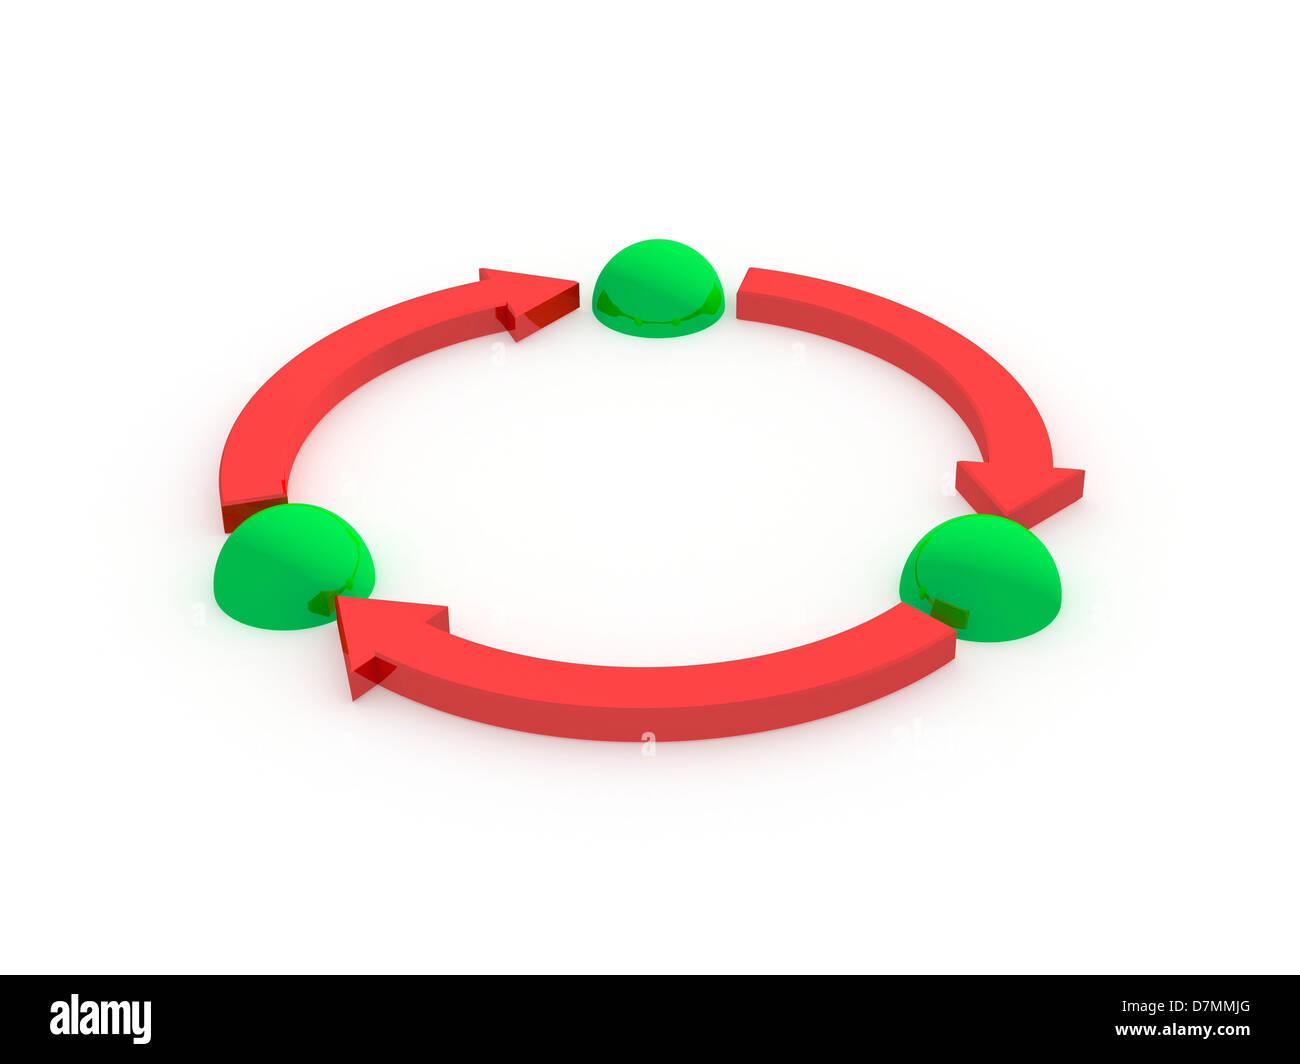 Cycle, conceptual artwork - Stock Image